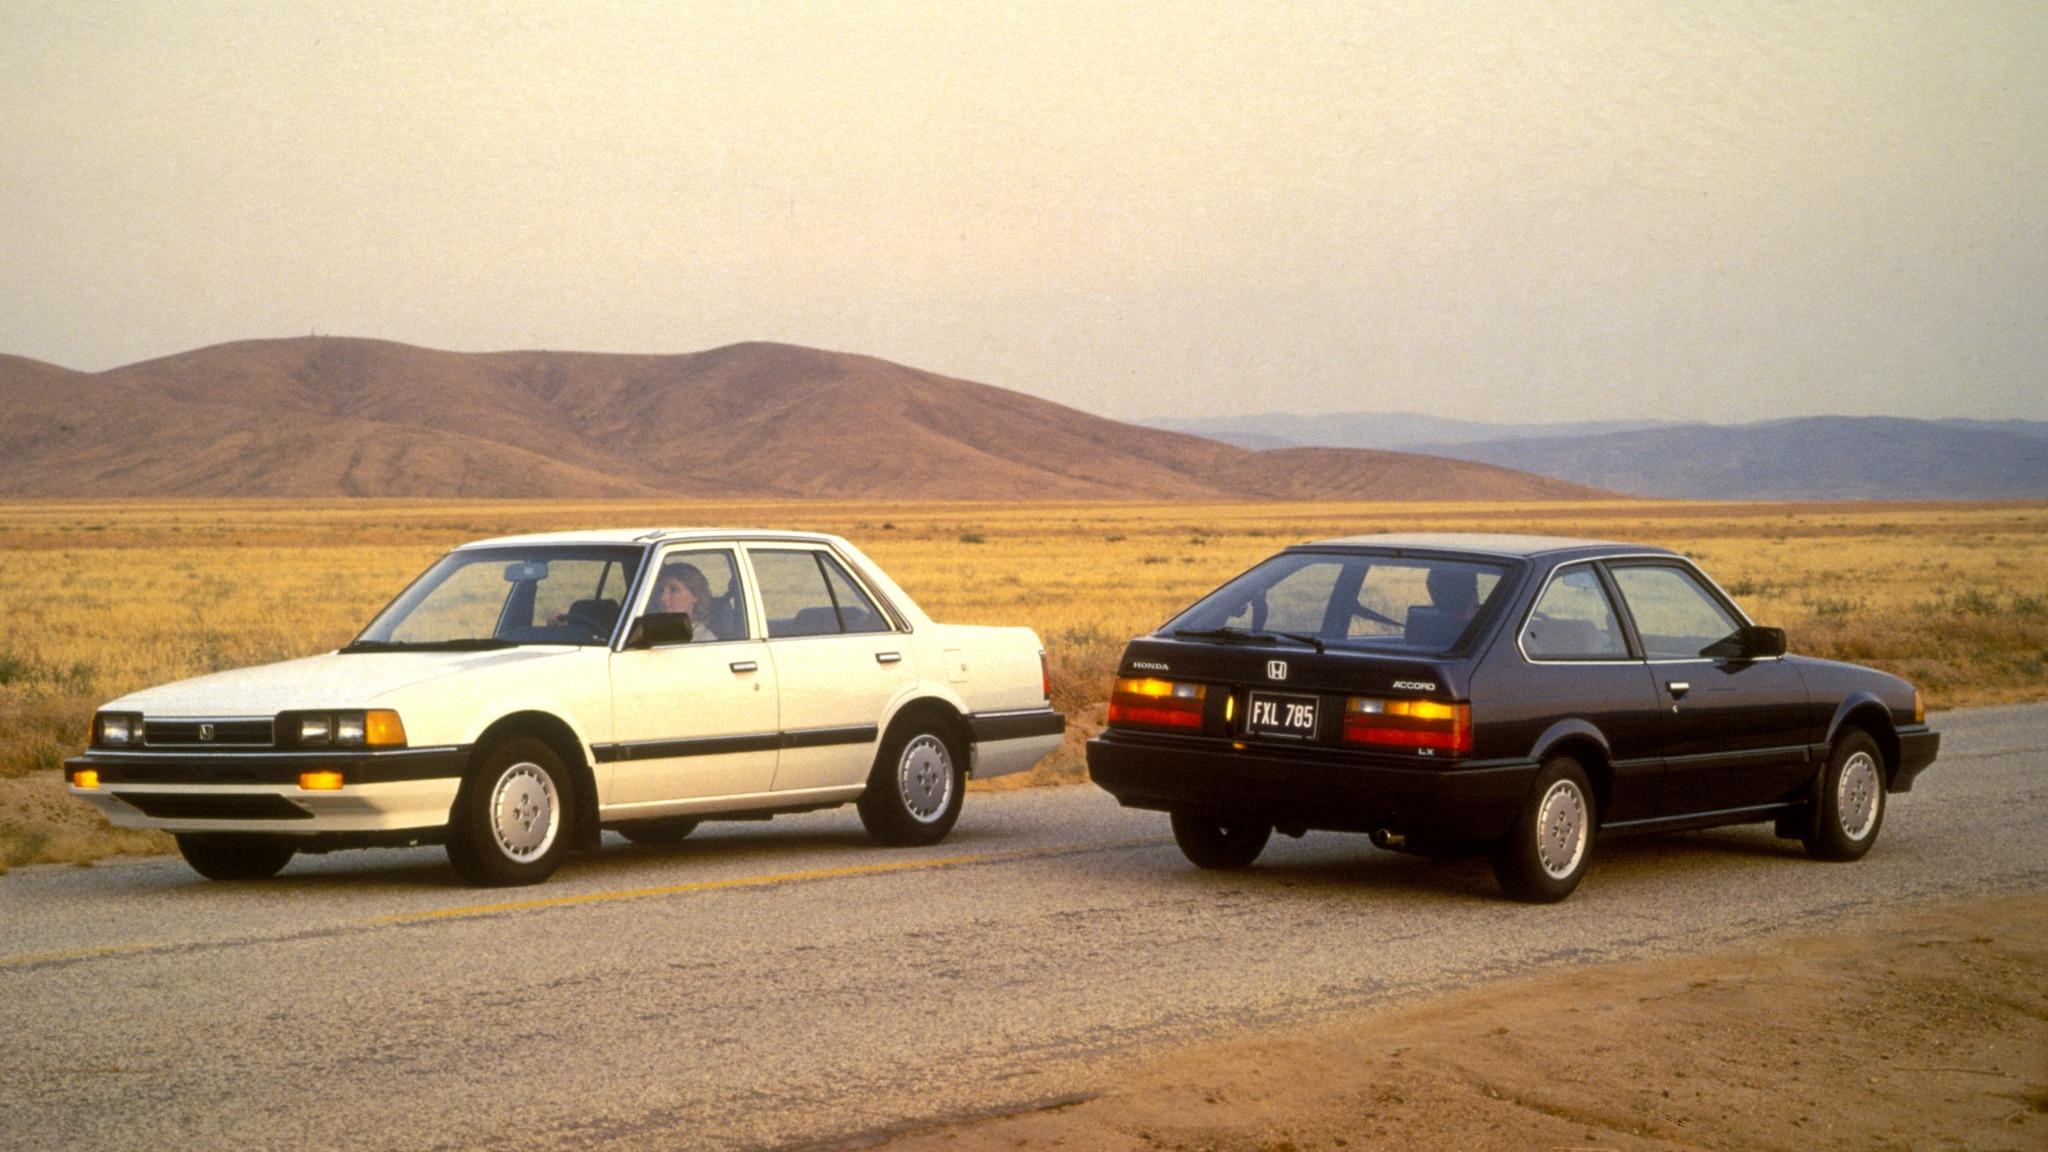 Kelebihan Honda Accord 1985 Murah Berkualitas